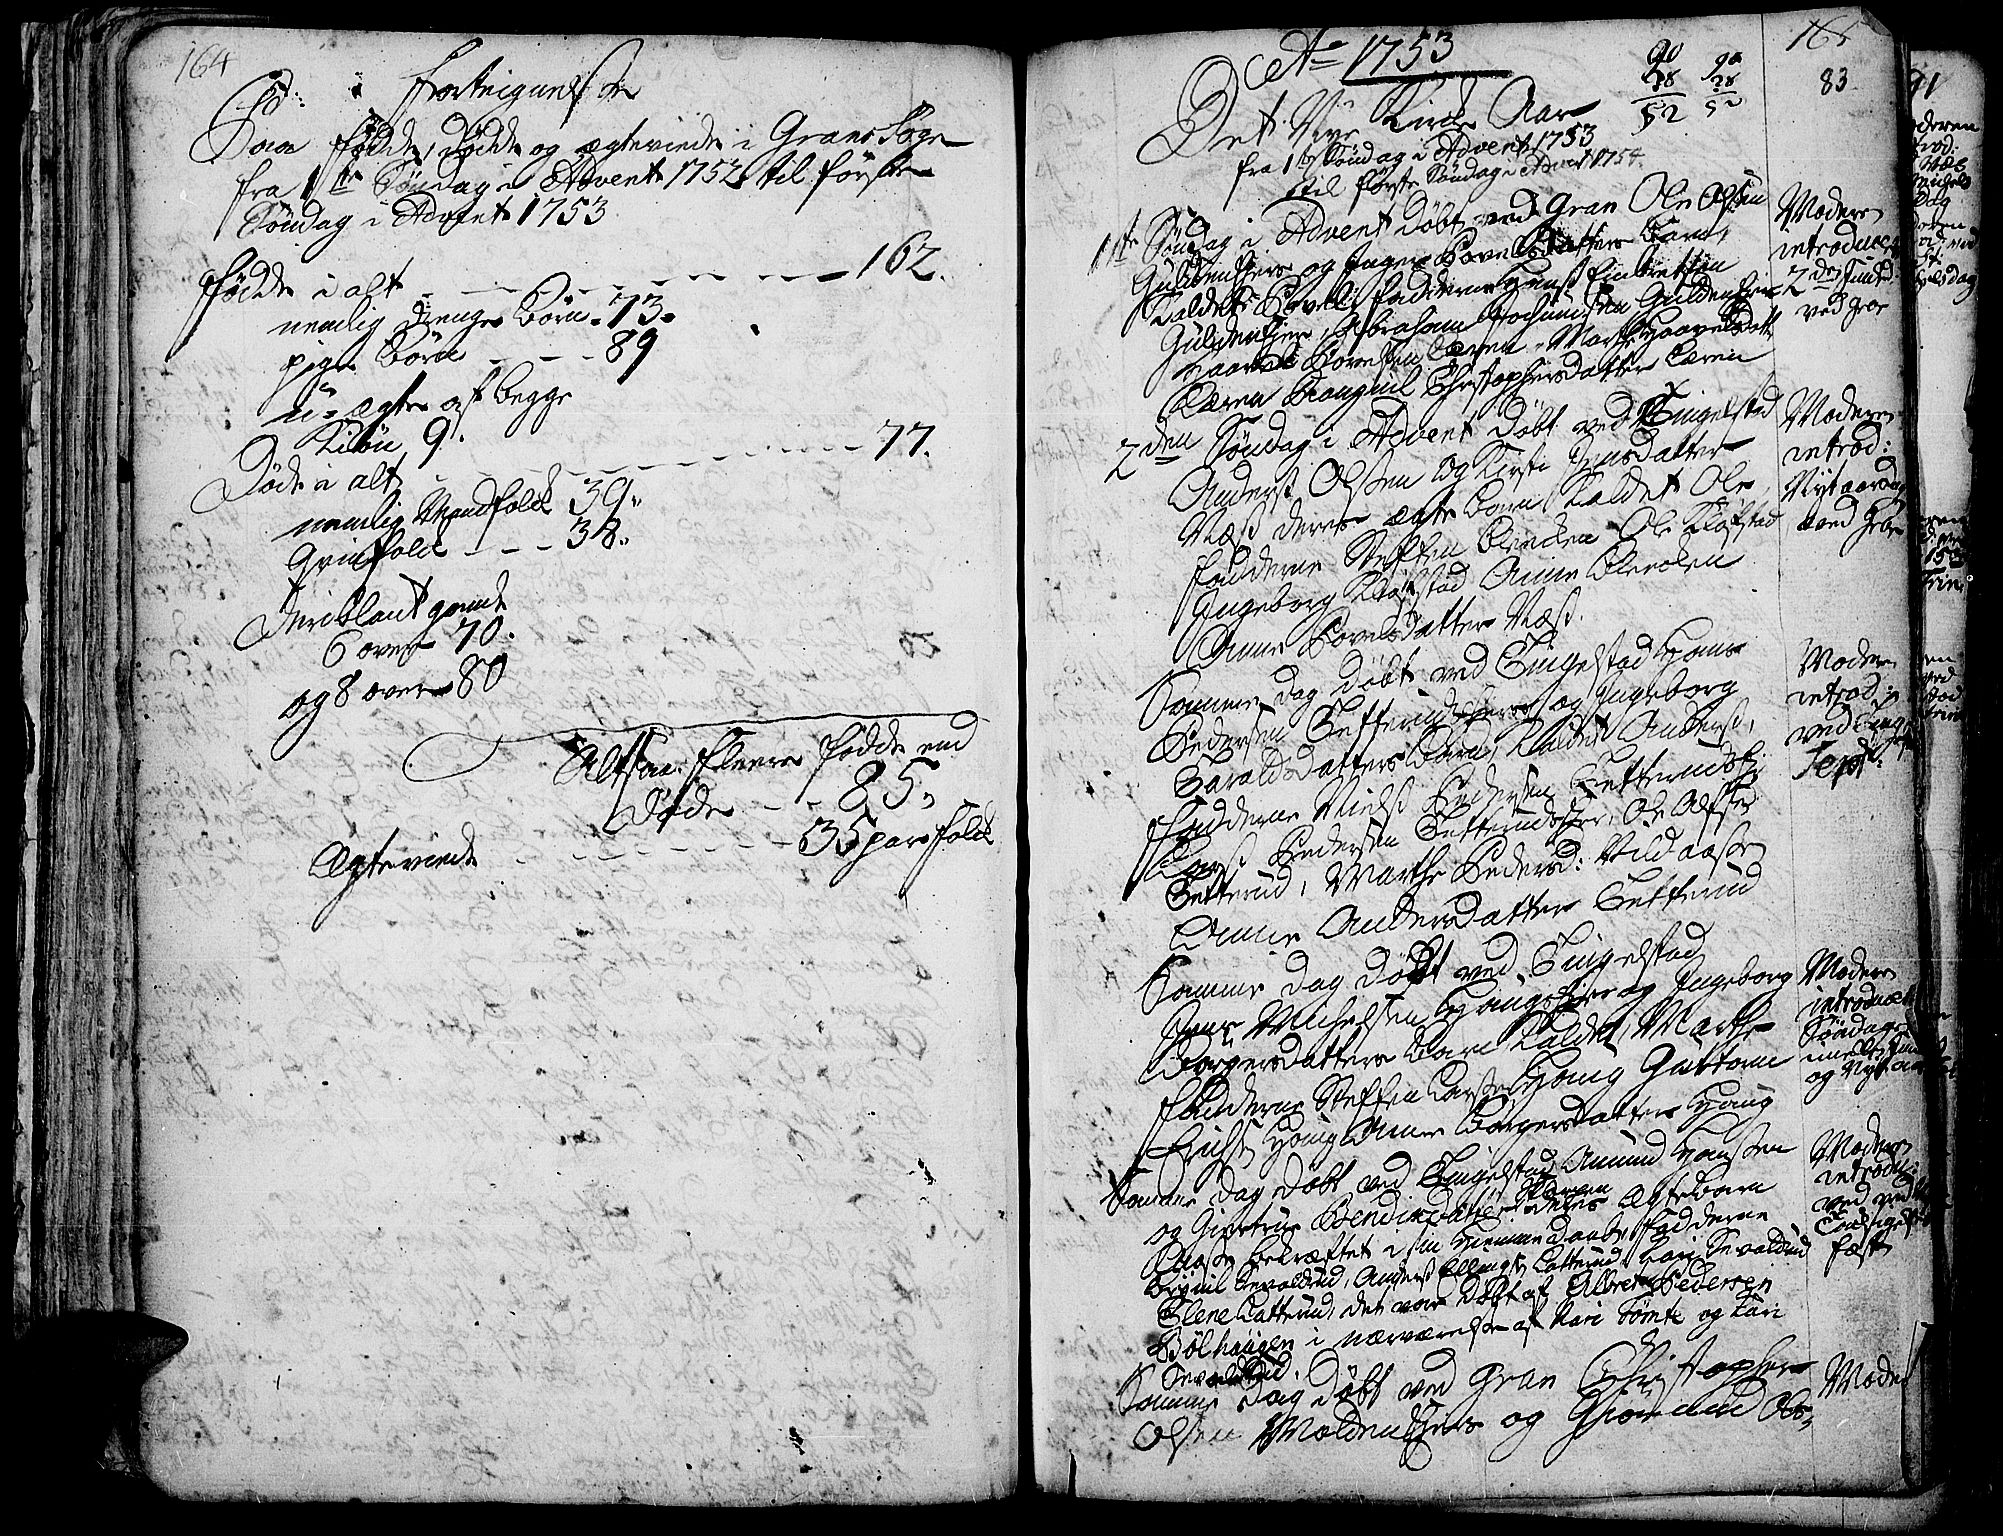 SAH, Gran prestekontor, Ministerialbok nr. 3, 1745-1758, s. 83